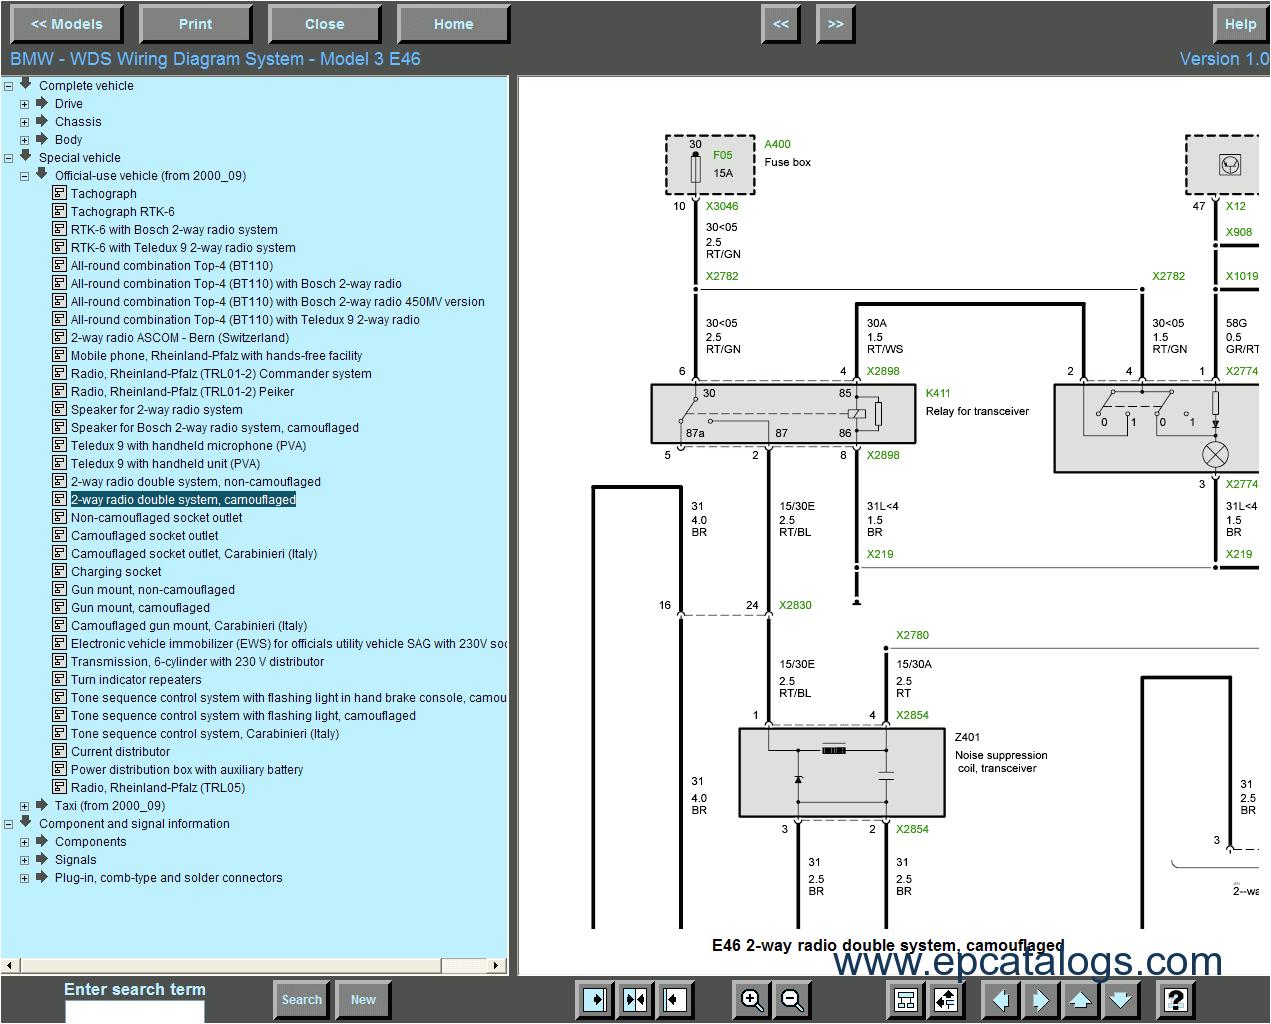 bmw wiring diagram wds wiring diagram user wds bmw wiring diagram system online bmw wds bmw